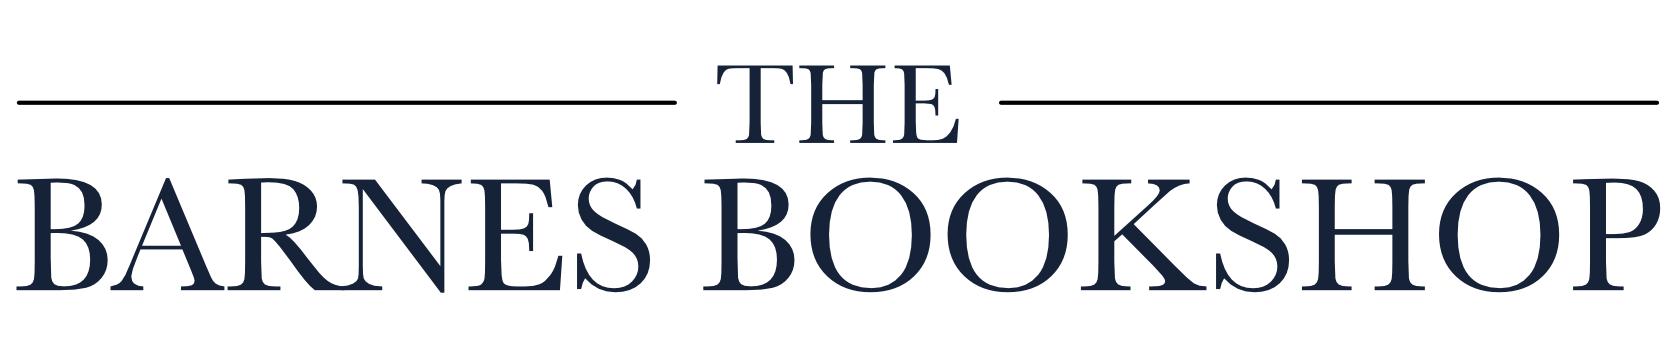 Barnes Bookshop logo